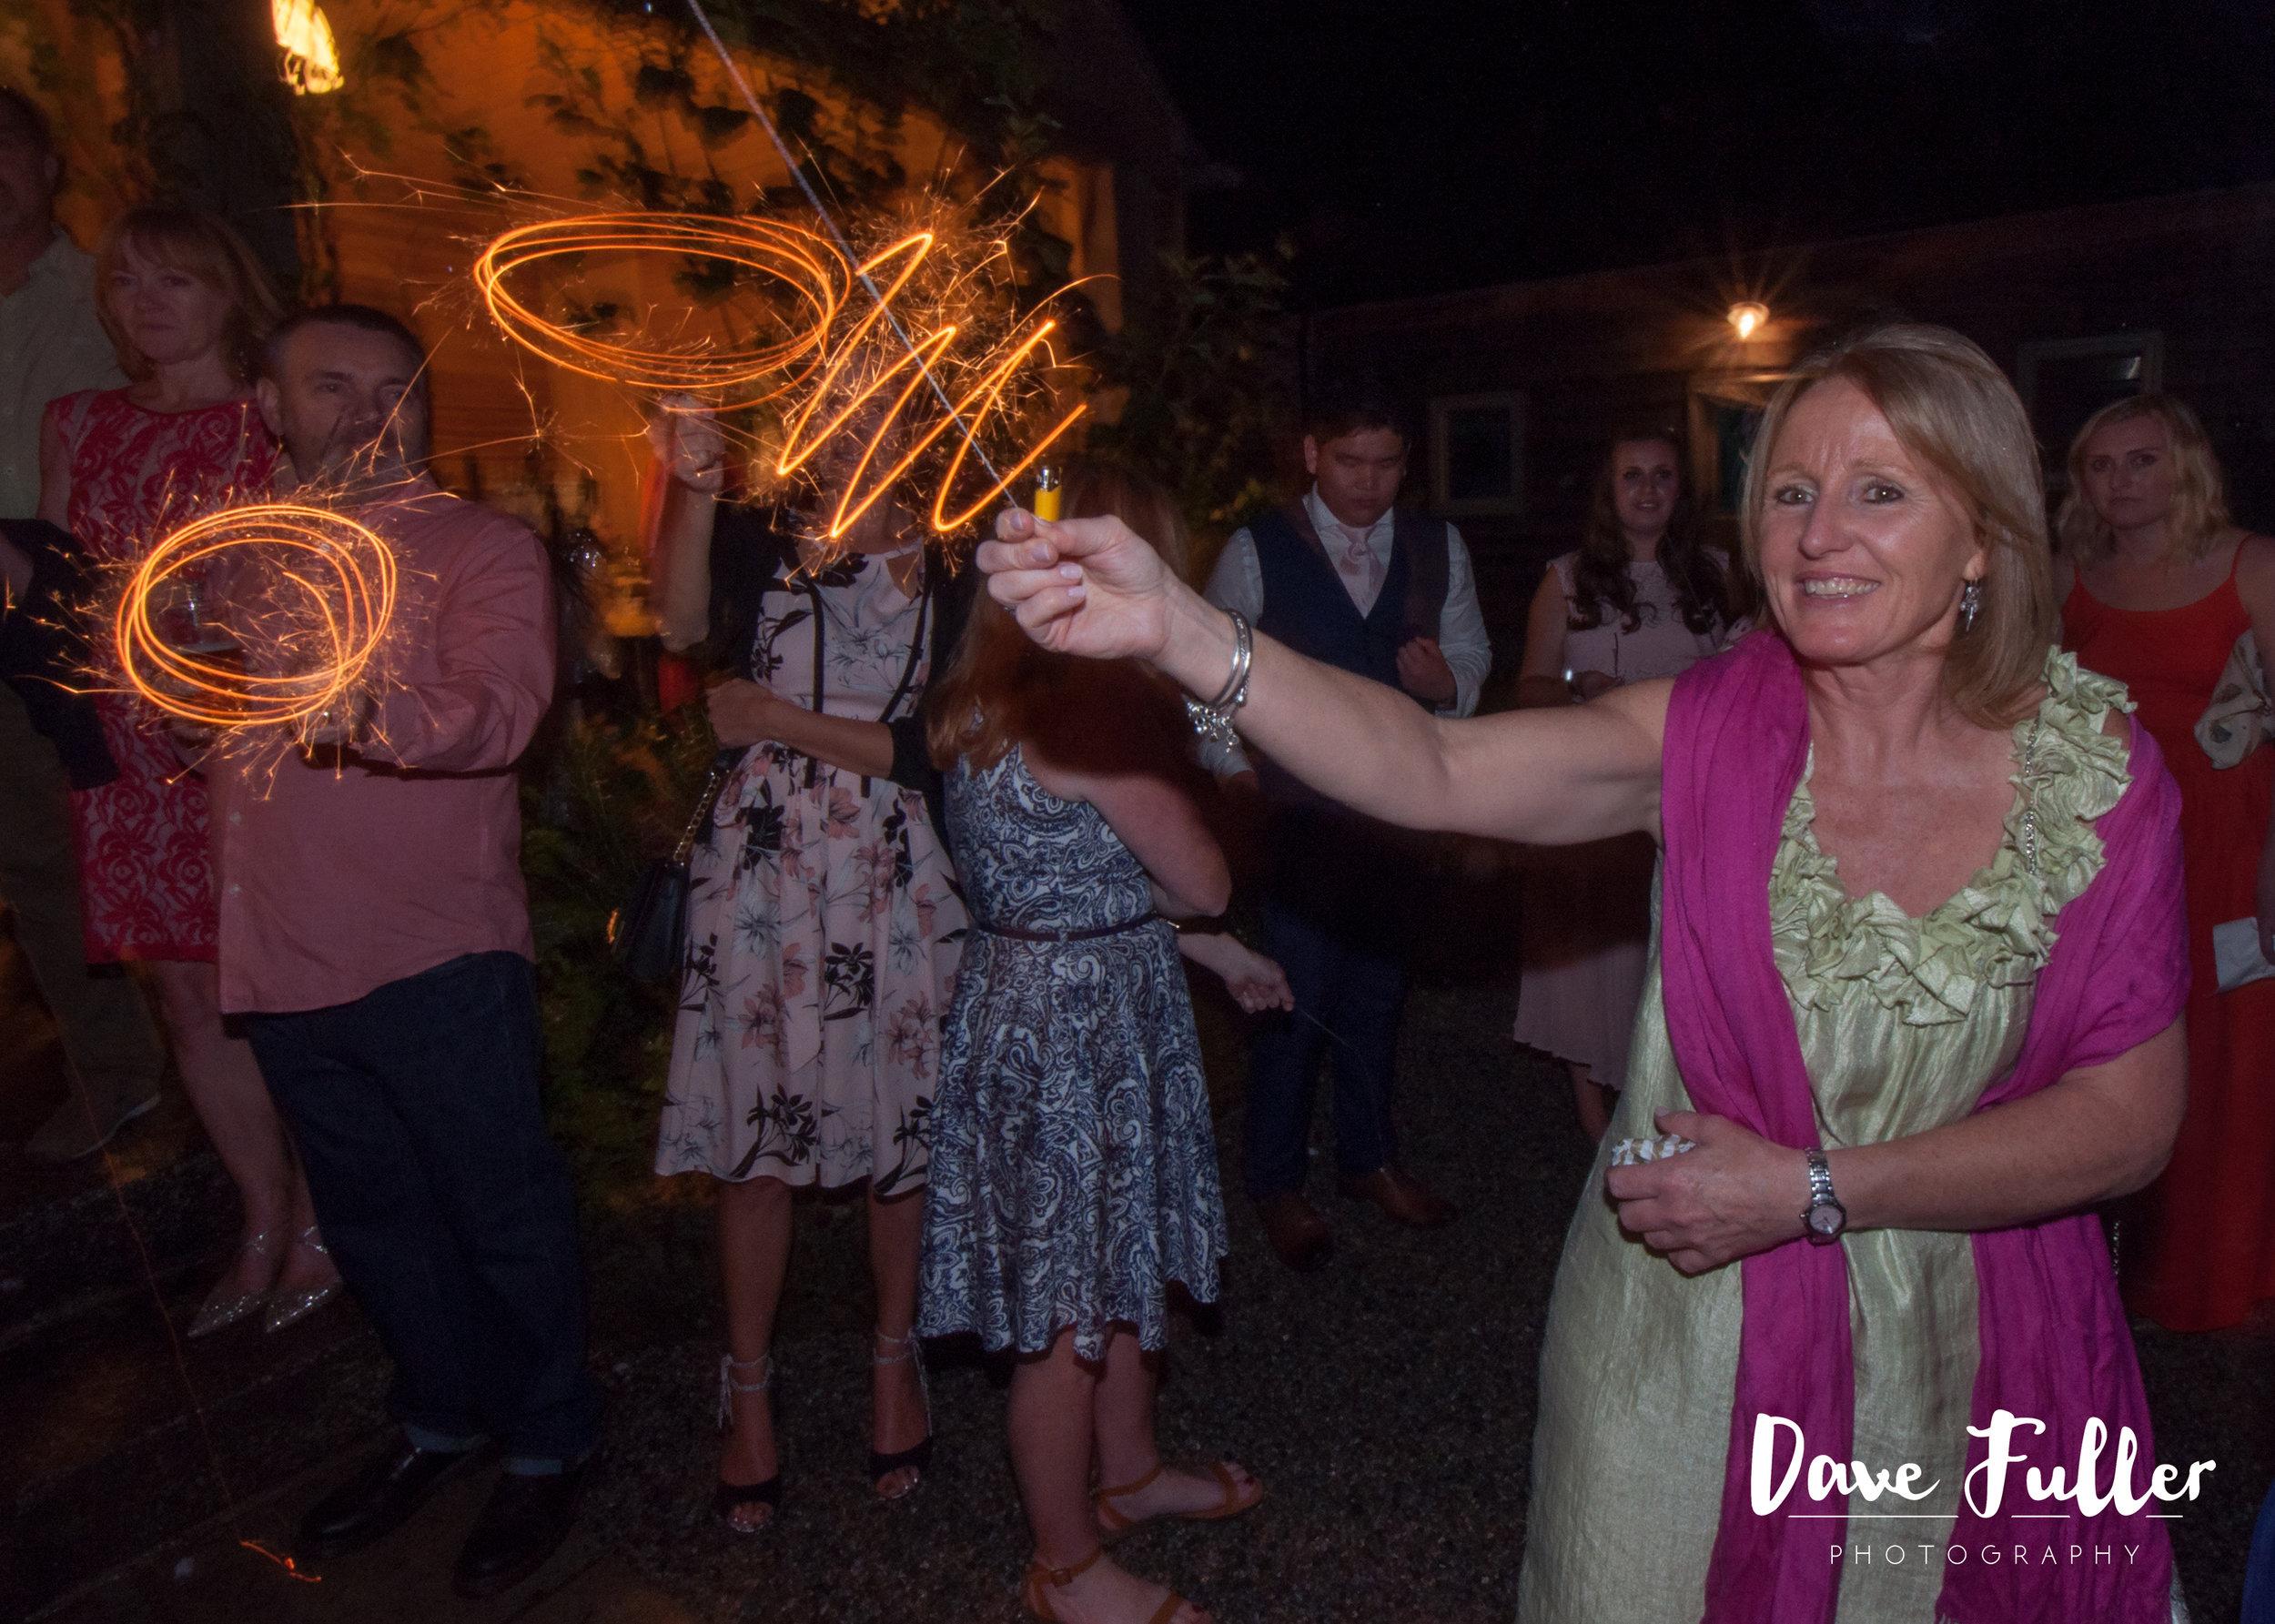 Nottingham Wedding PhotographerMckellar-Savage9.jpg